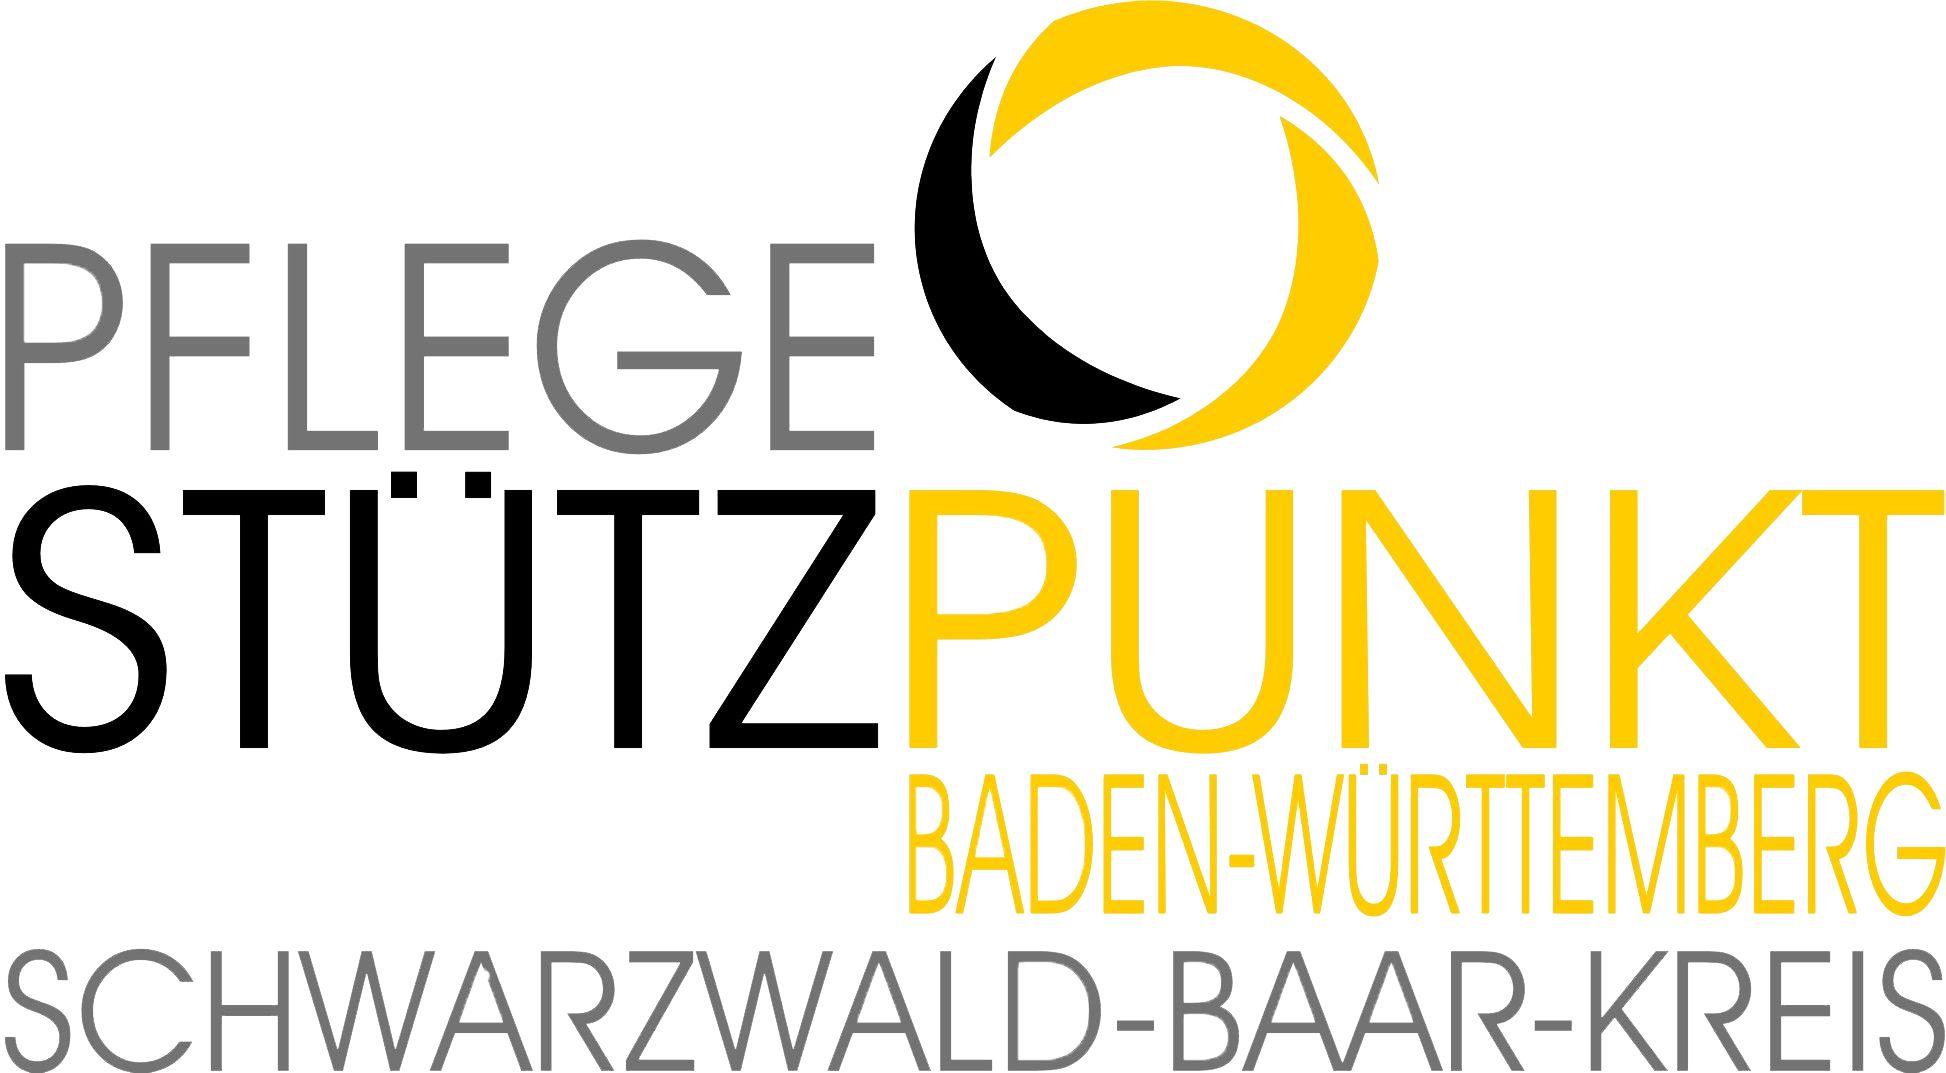 https://www.betreuung-und-pflege.de/app/files/2021/02/Pflegestuetzpunkt-Baden-Wuerttemberg.jpg